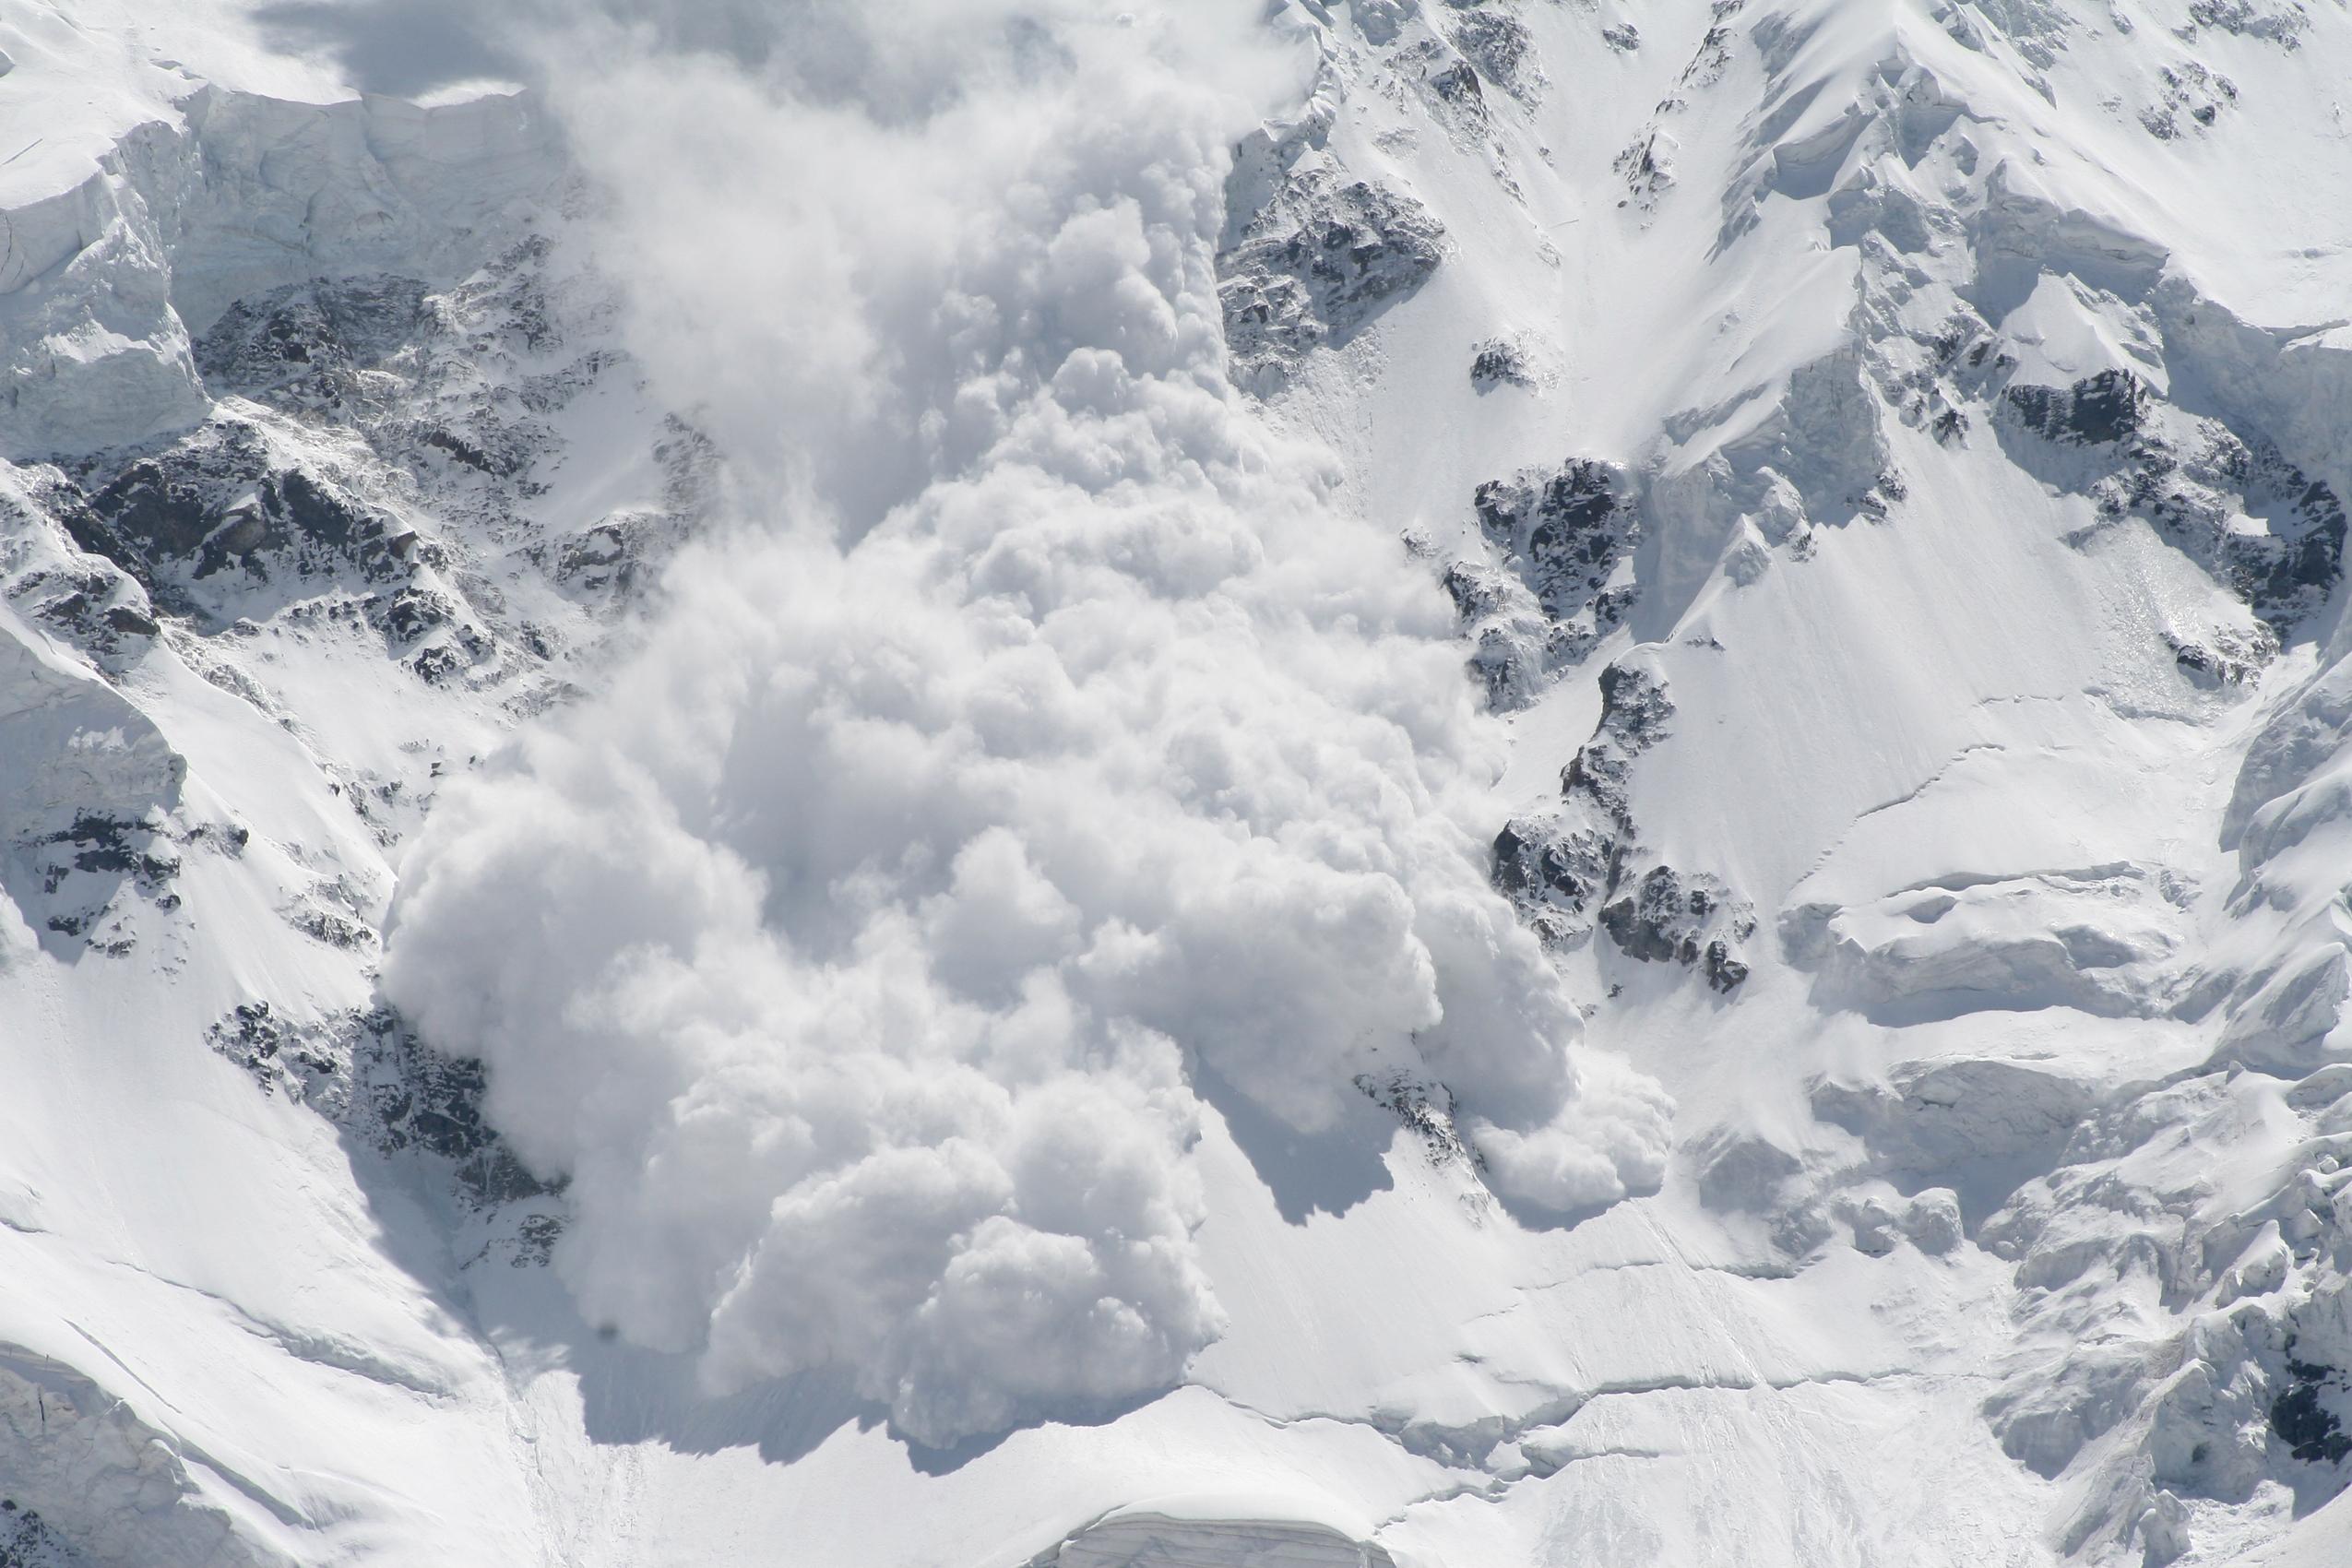 Avalanche #4